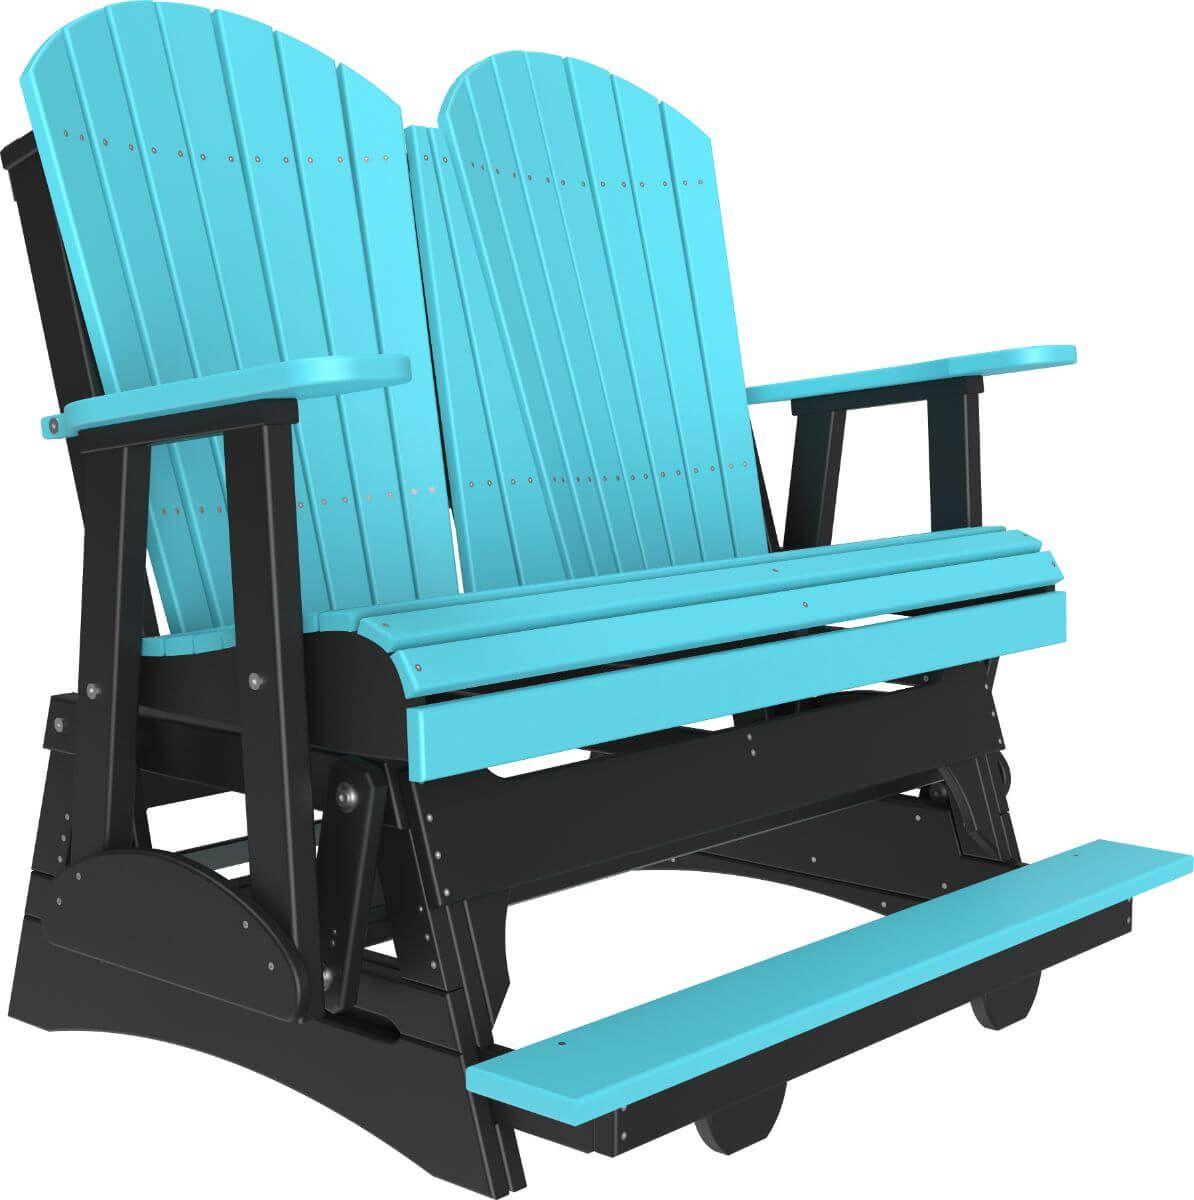 Aruba Blue and Black Tahiti Loveseat Balcony Glider